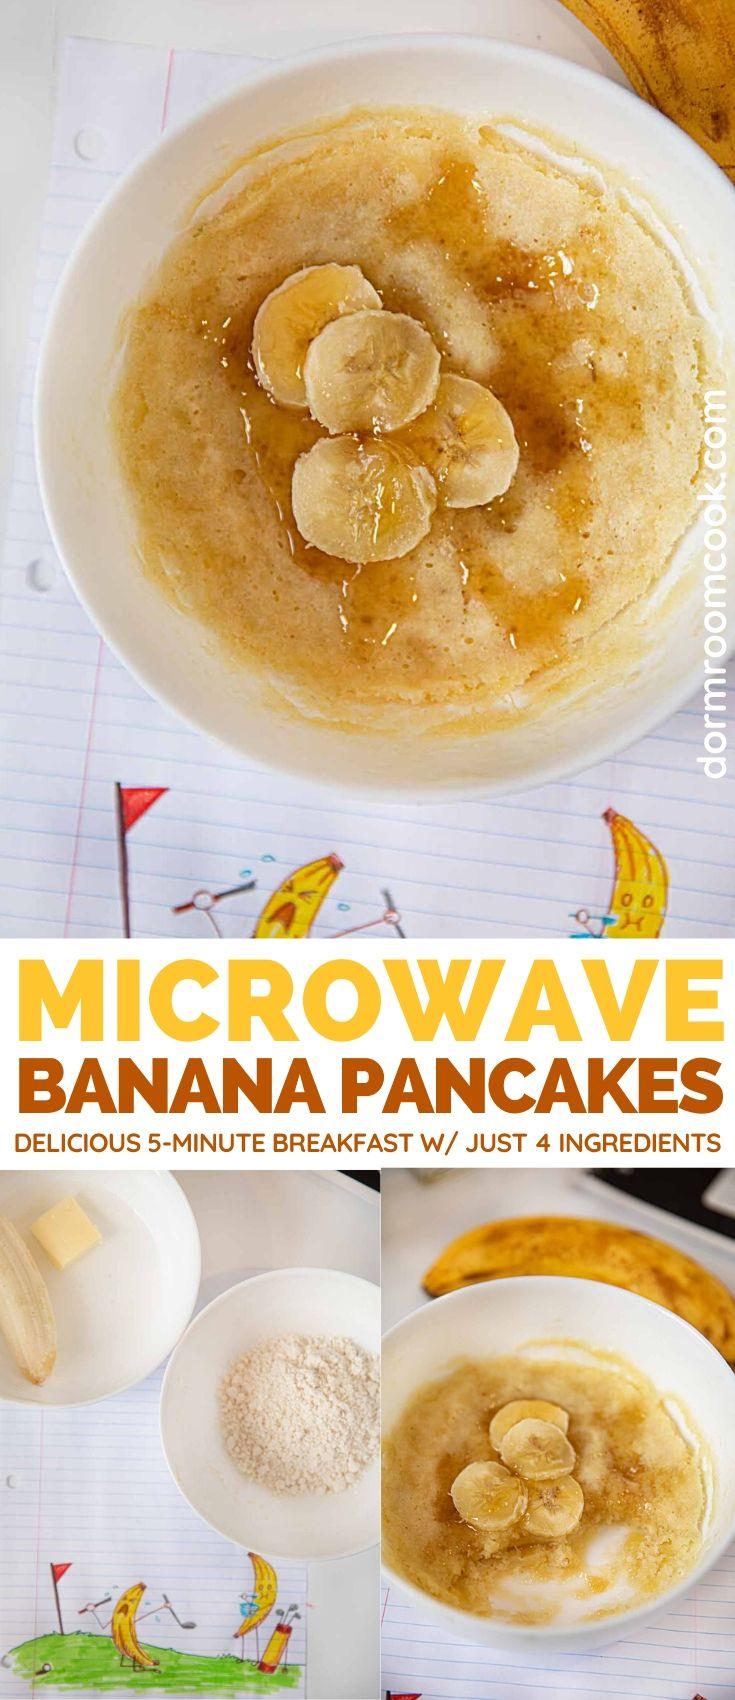 Easy Microwave Banana Pancakes collage